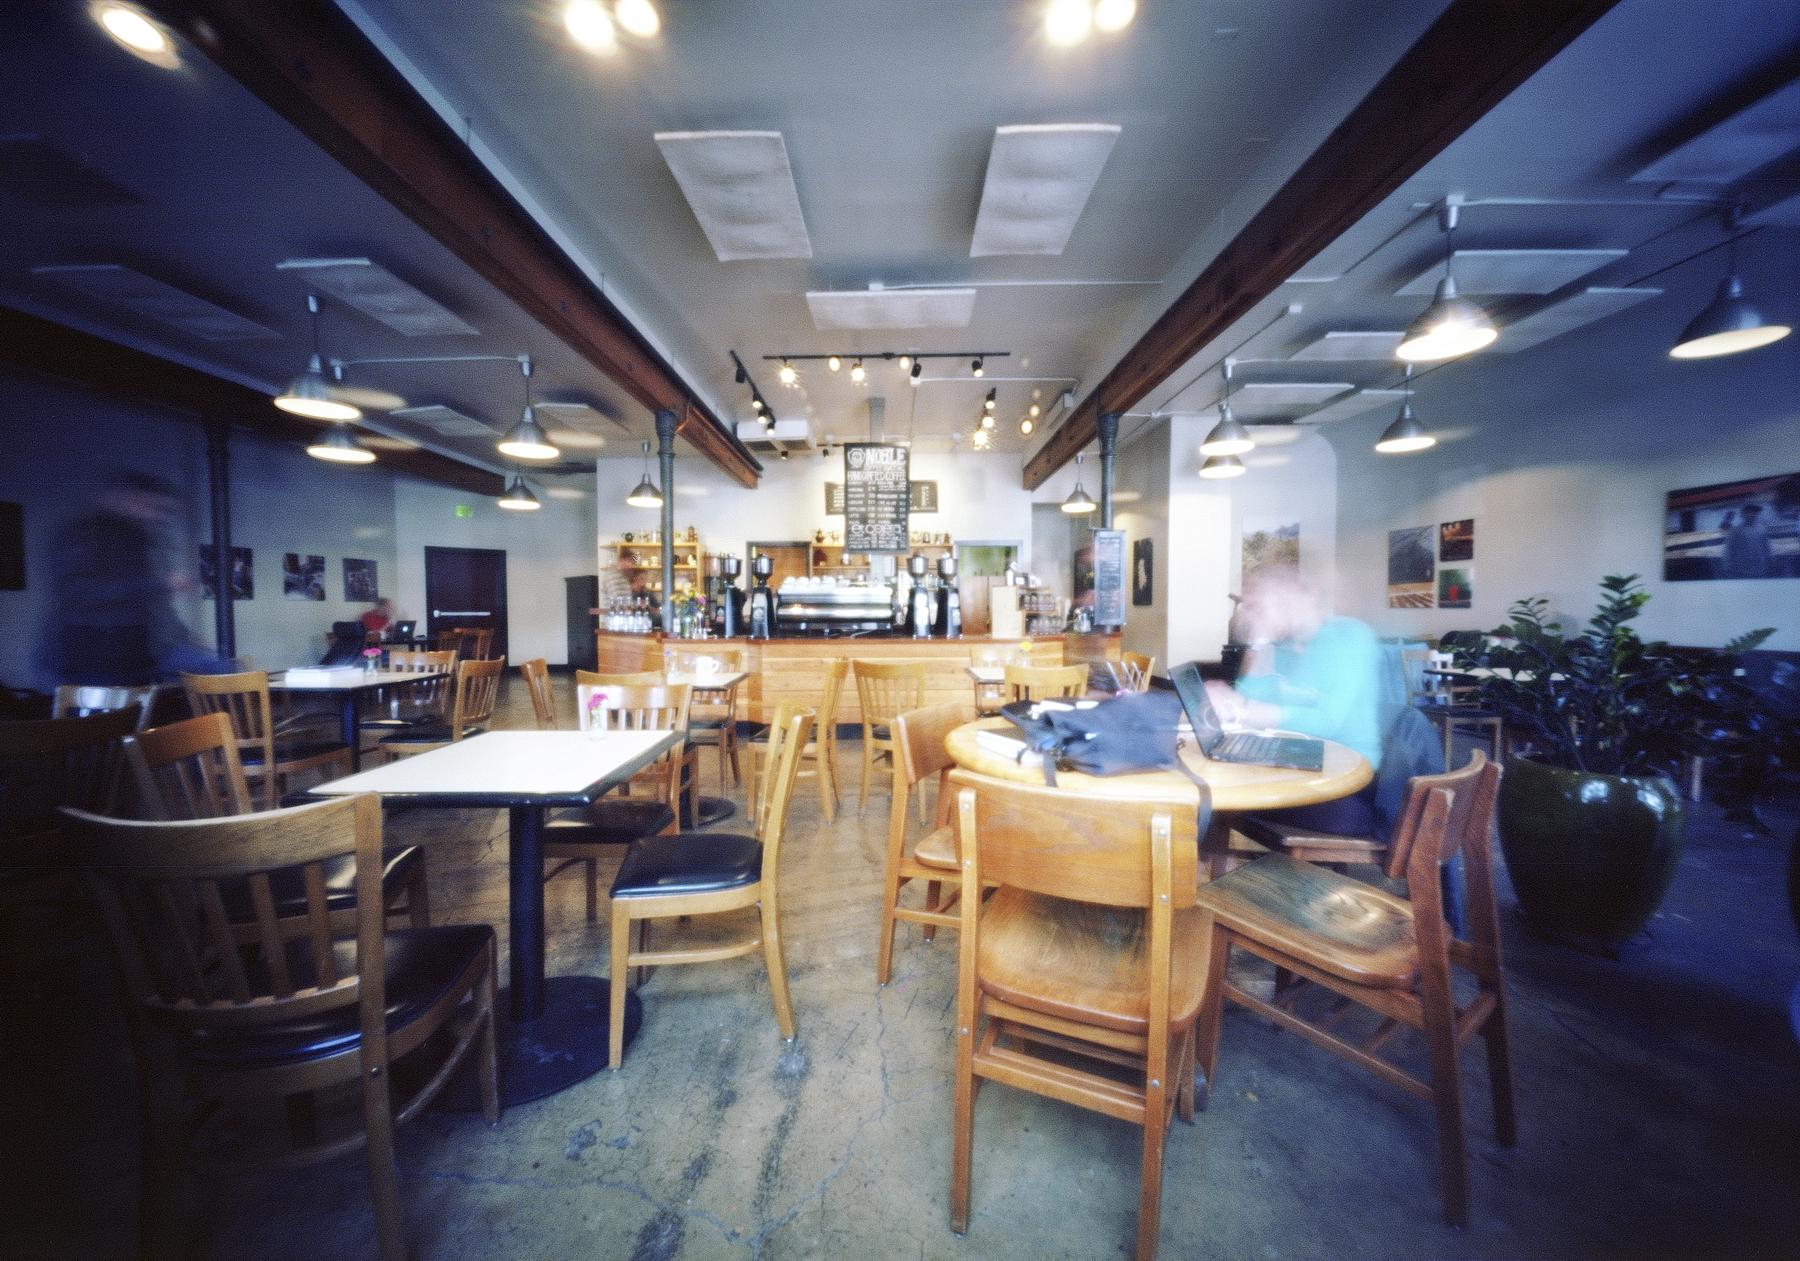 Five Minutes at Noble | Innova 6x9 Pinhole | Ektar 100 | Colton Allen